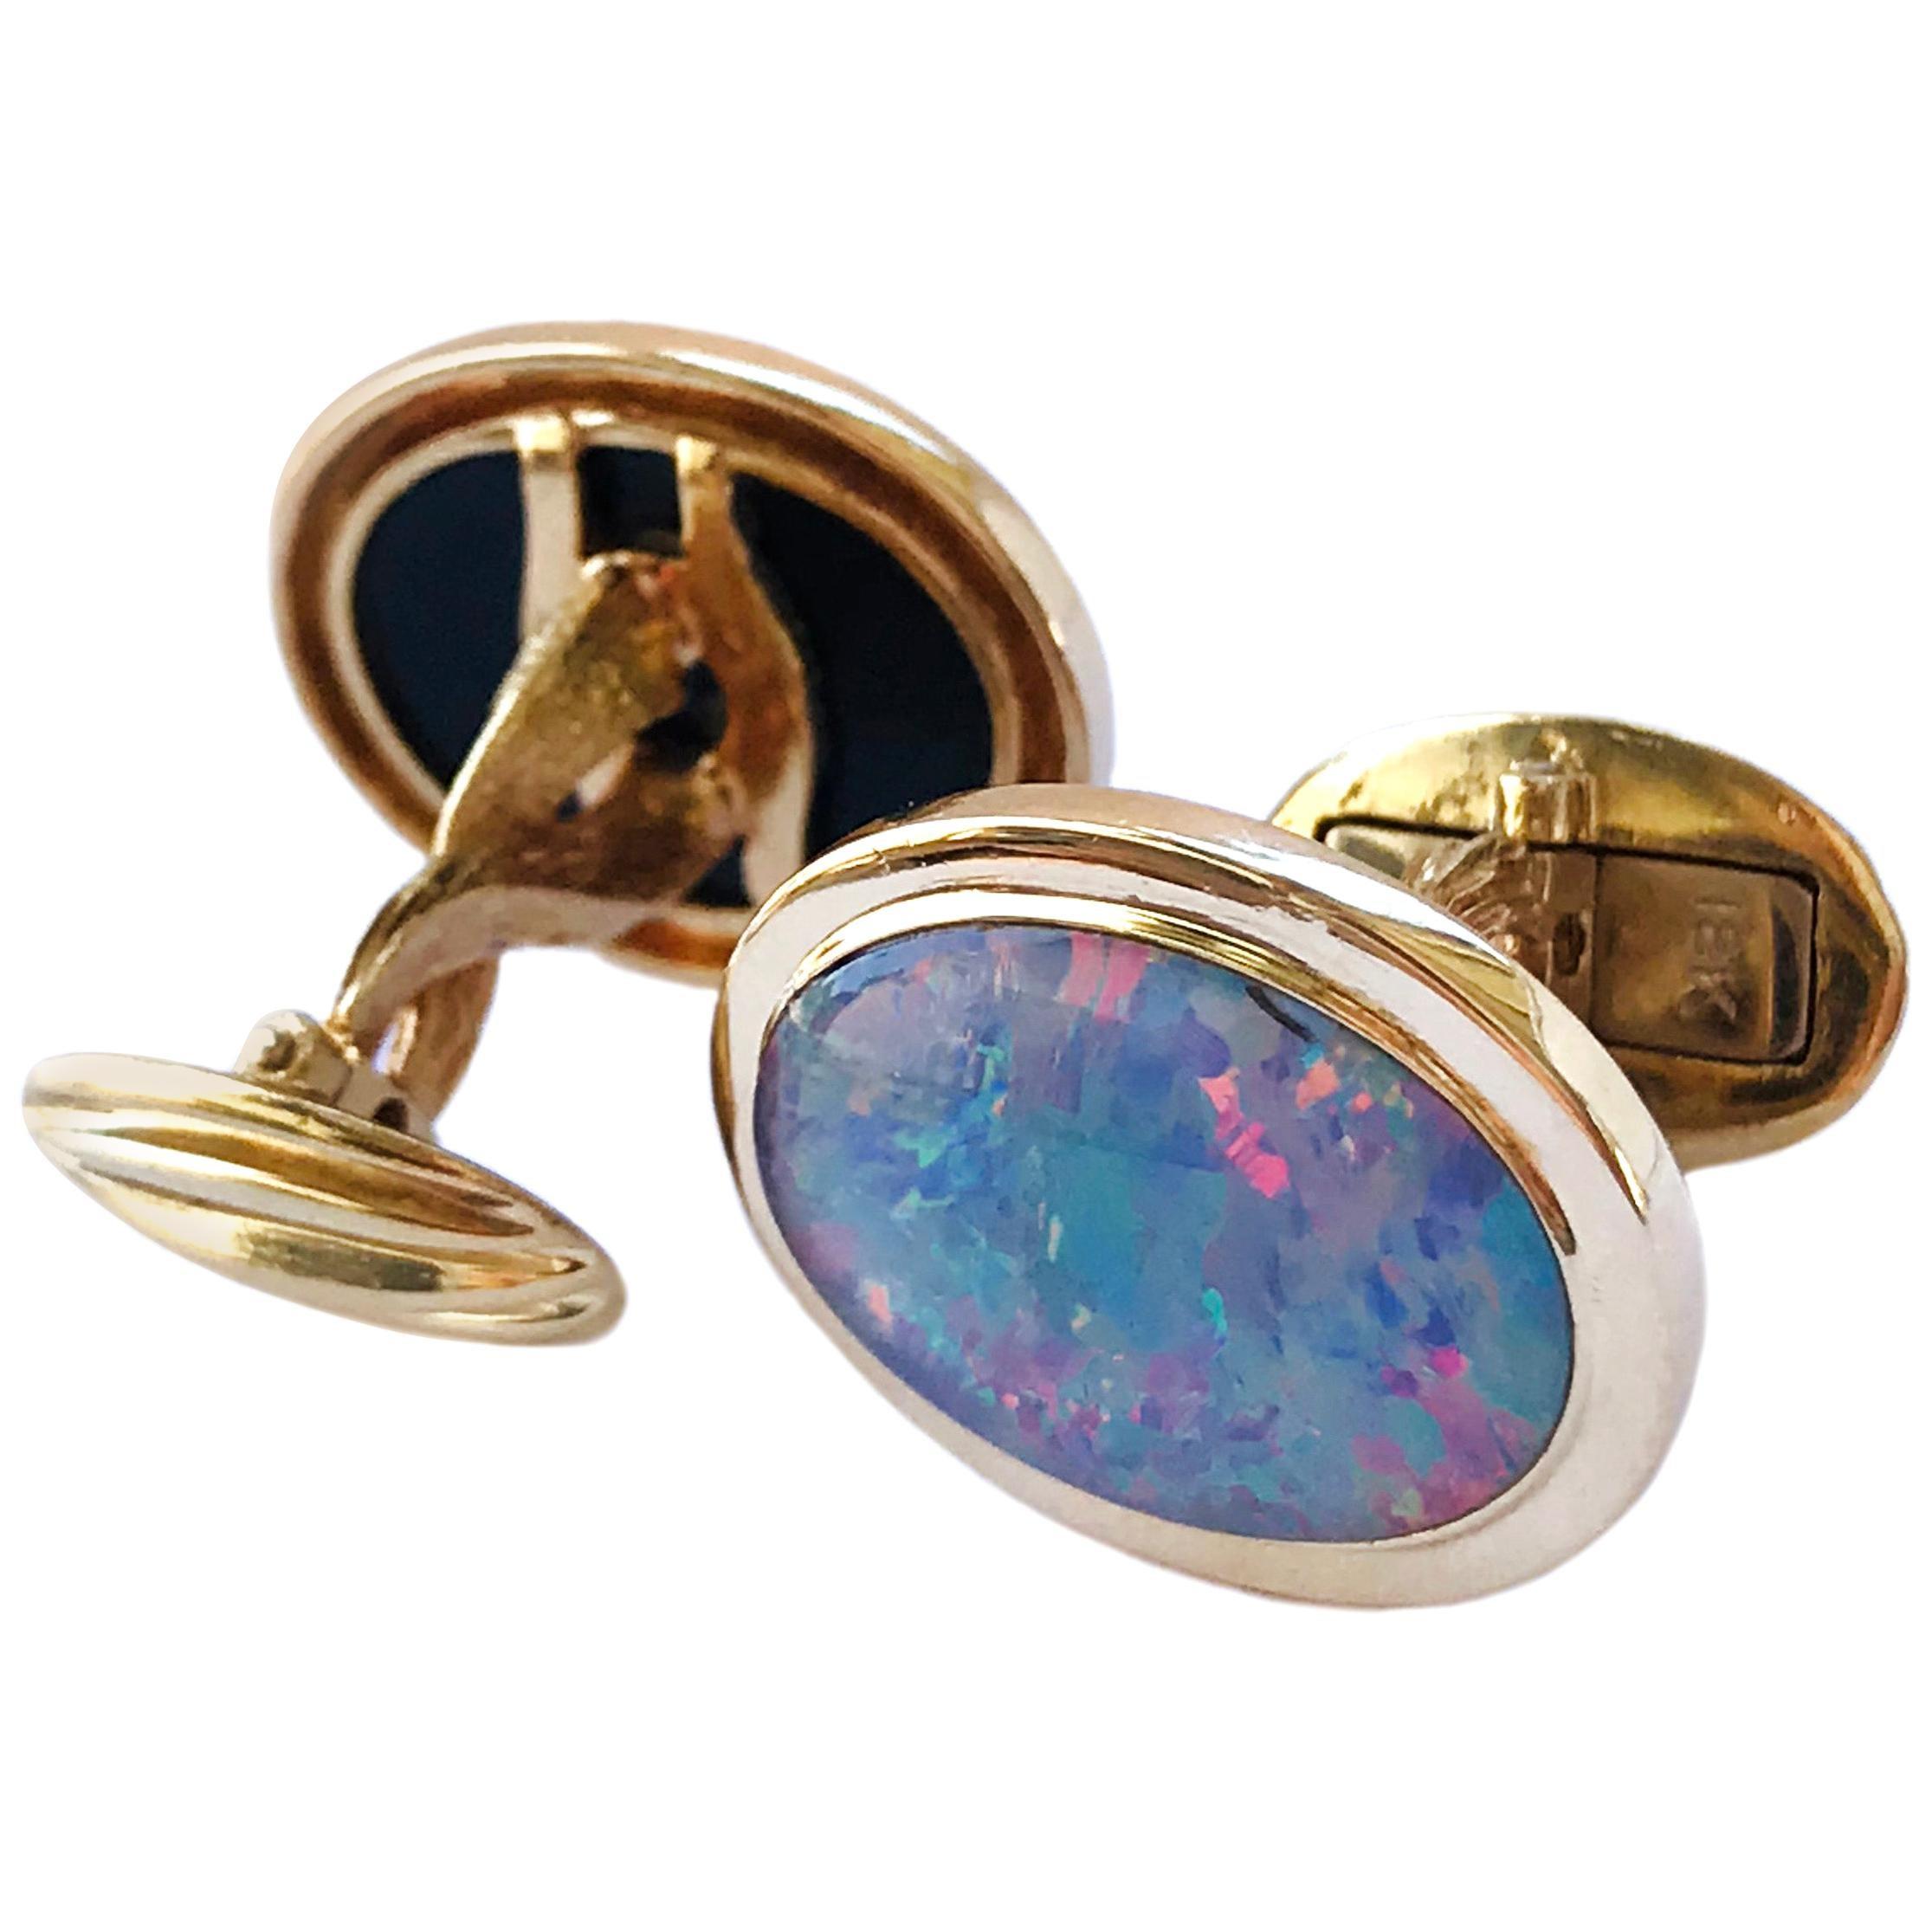 18 Karat Black Opal Oval Cufflinks